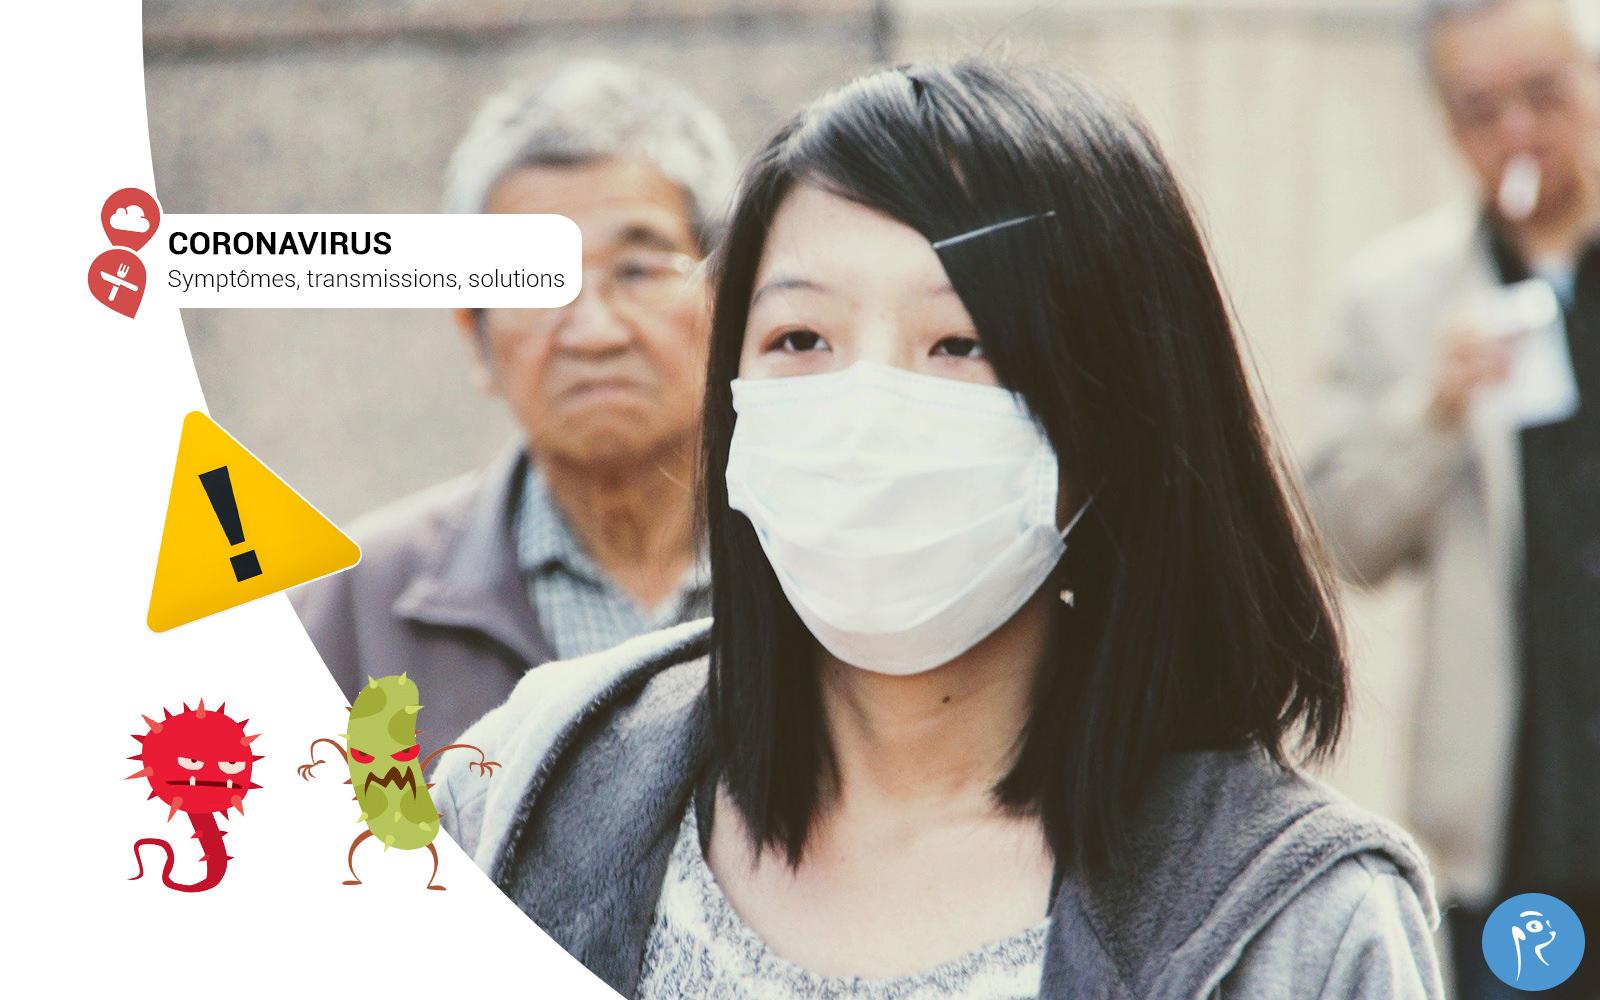 Le Coronavirus 2019-nCoV